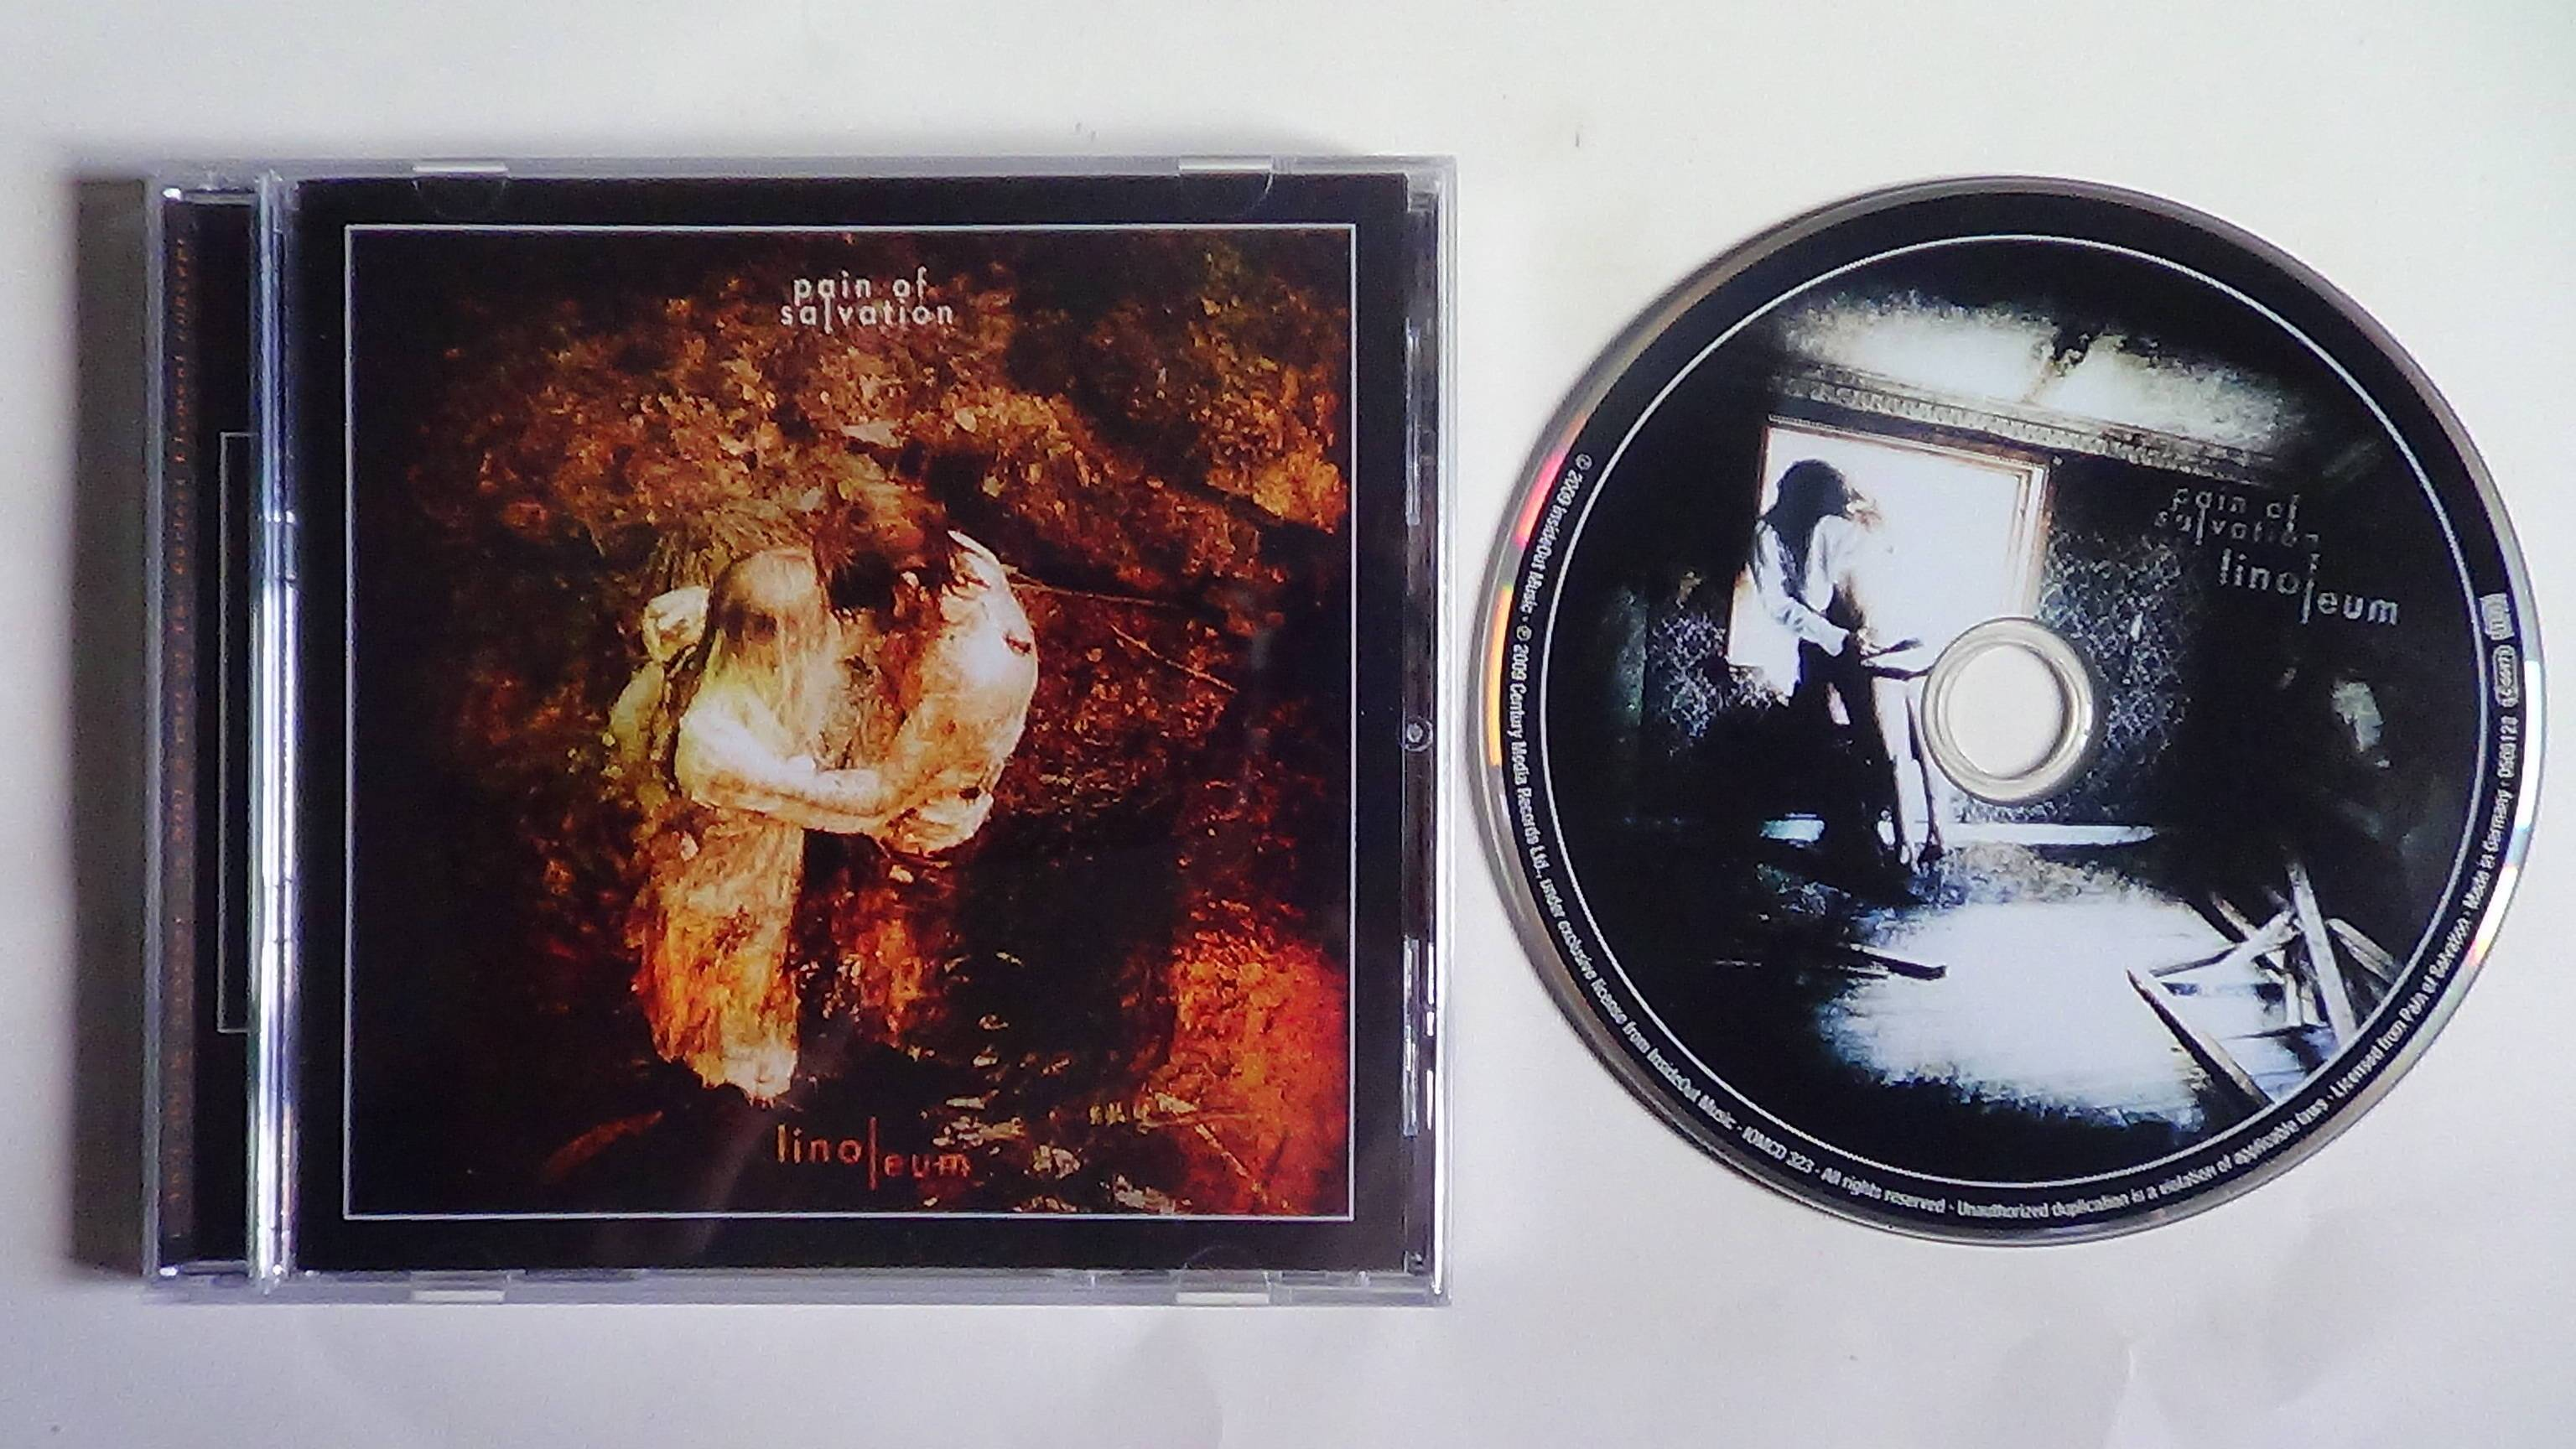 PAIN OF SALVATION - Linoleum - CD single